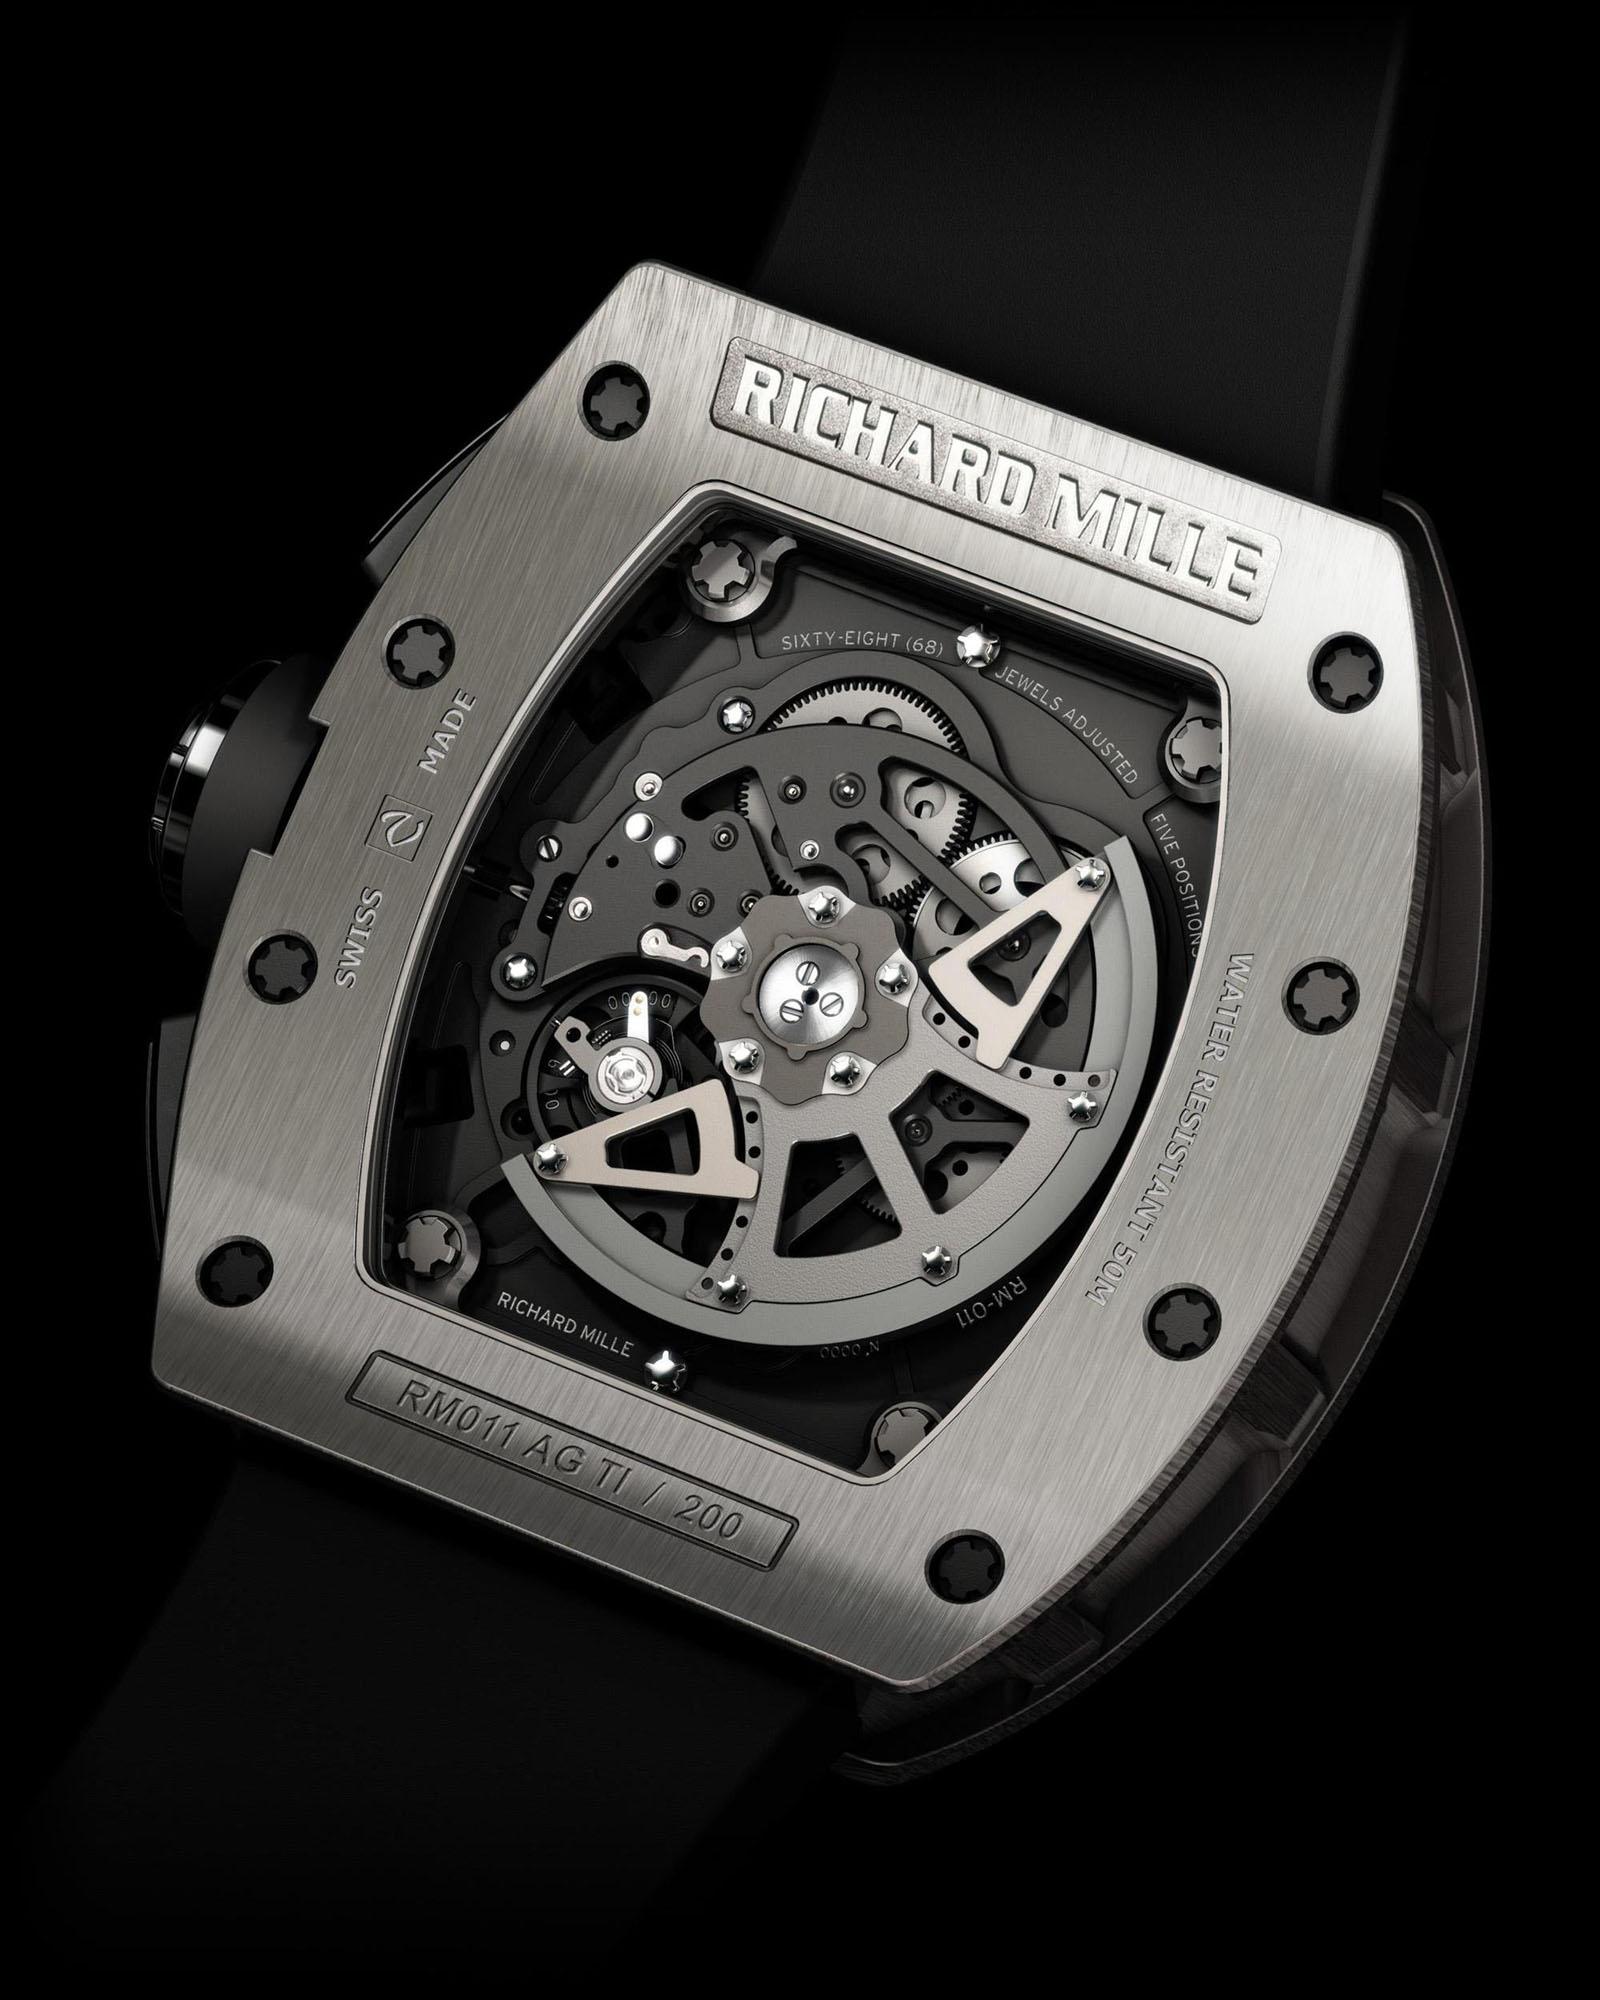 Richard Mille RM011 - Back